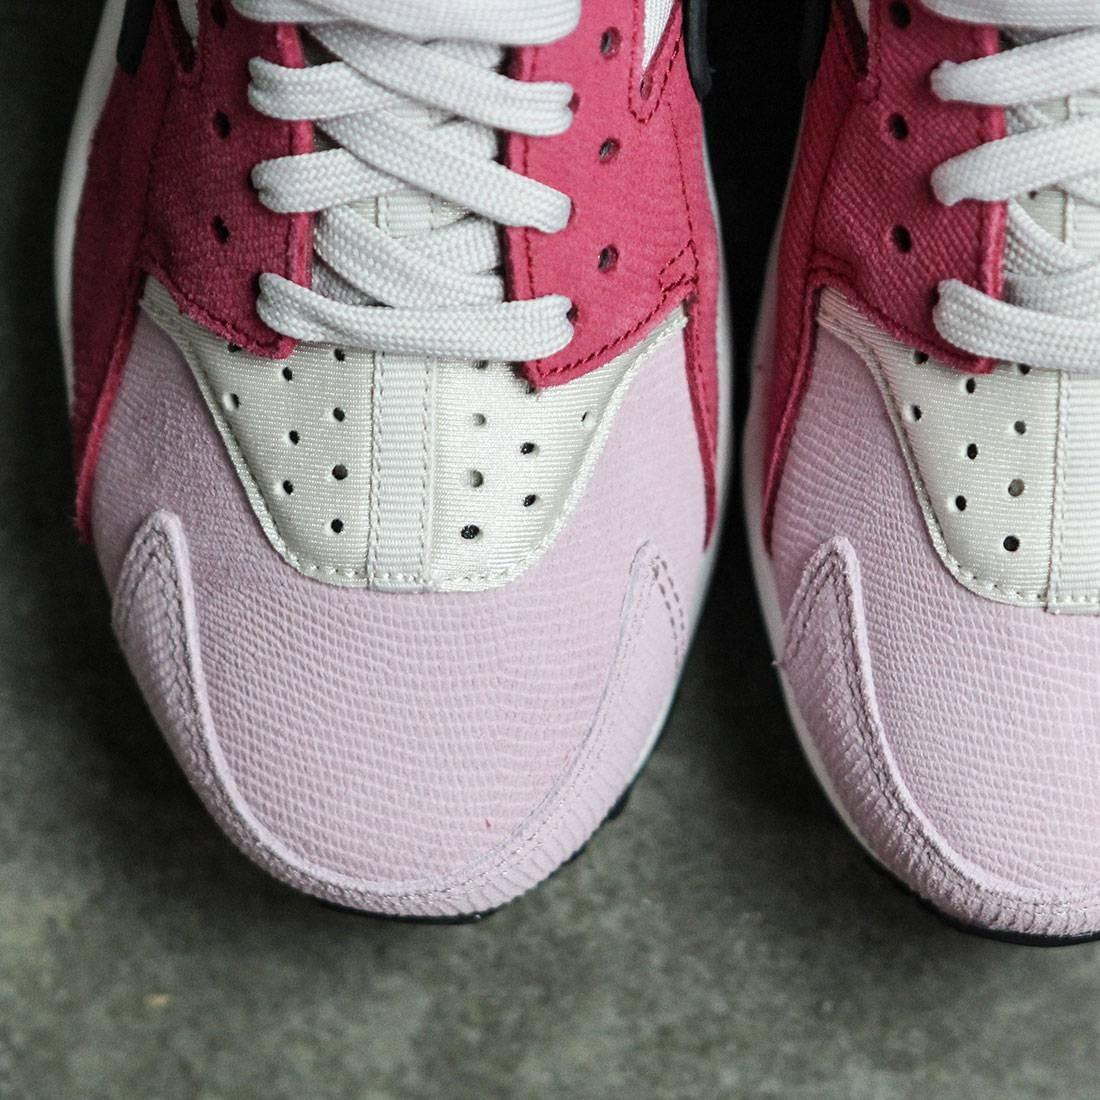 wholesale dealer ceba8 7d9a6 Nike Women Women S Nike Air Huarache Run Premium (light bone   black-noble  red-plum fog)